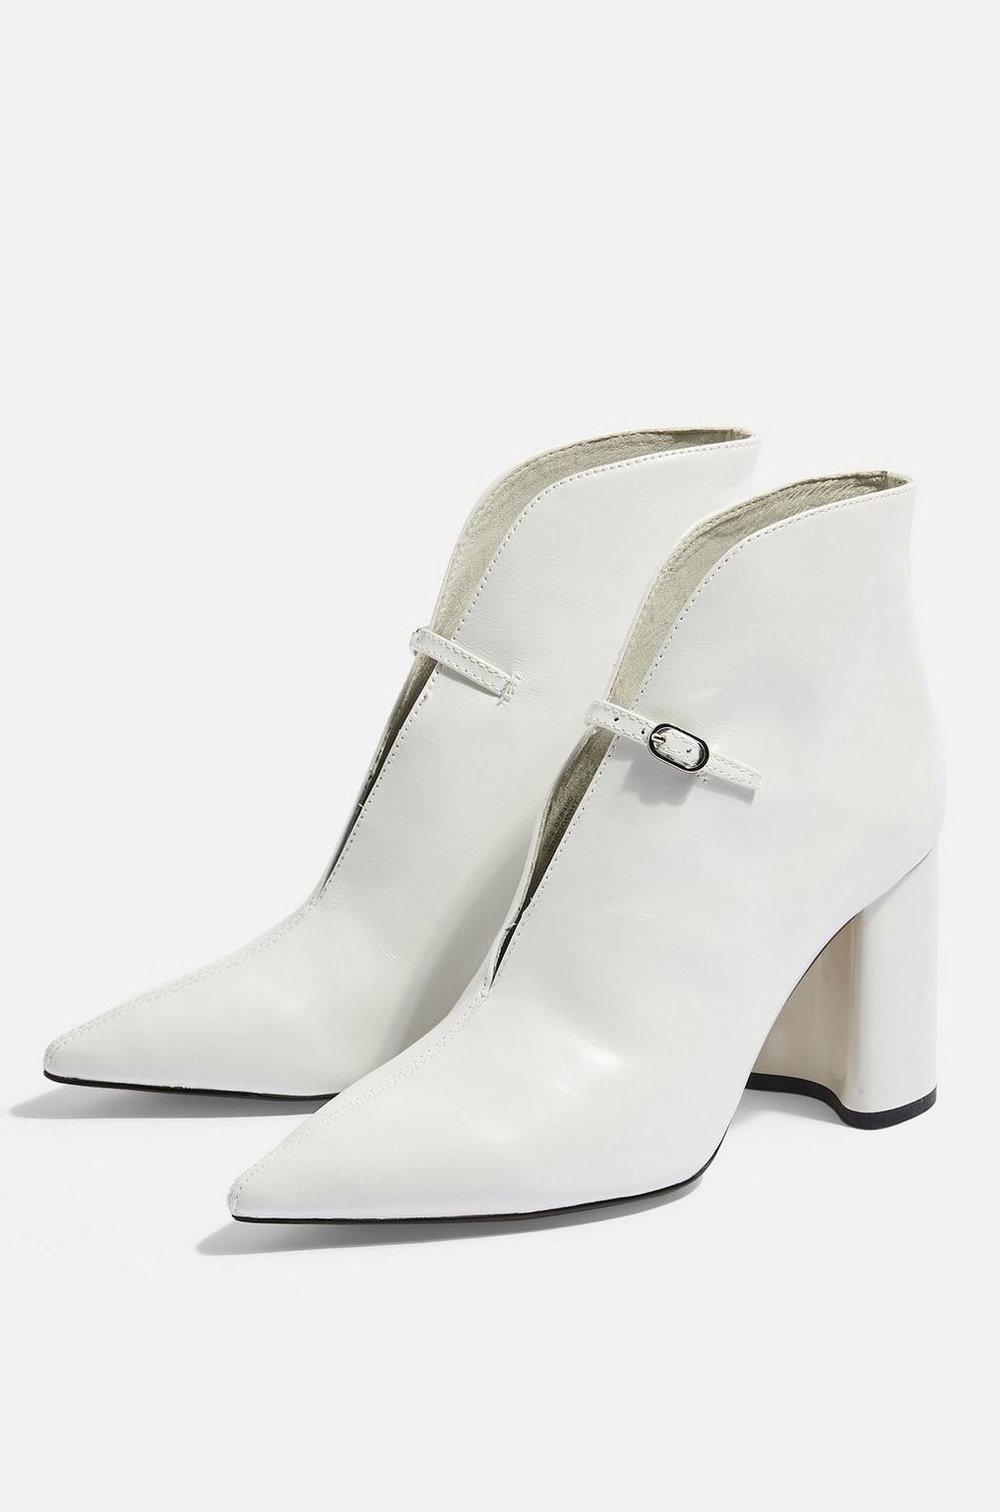 Top Shop White Boots  $130